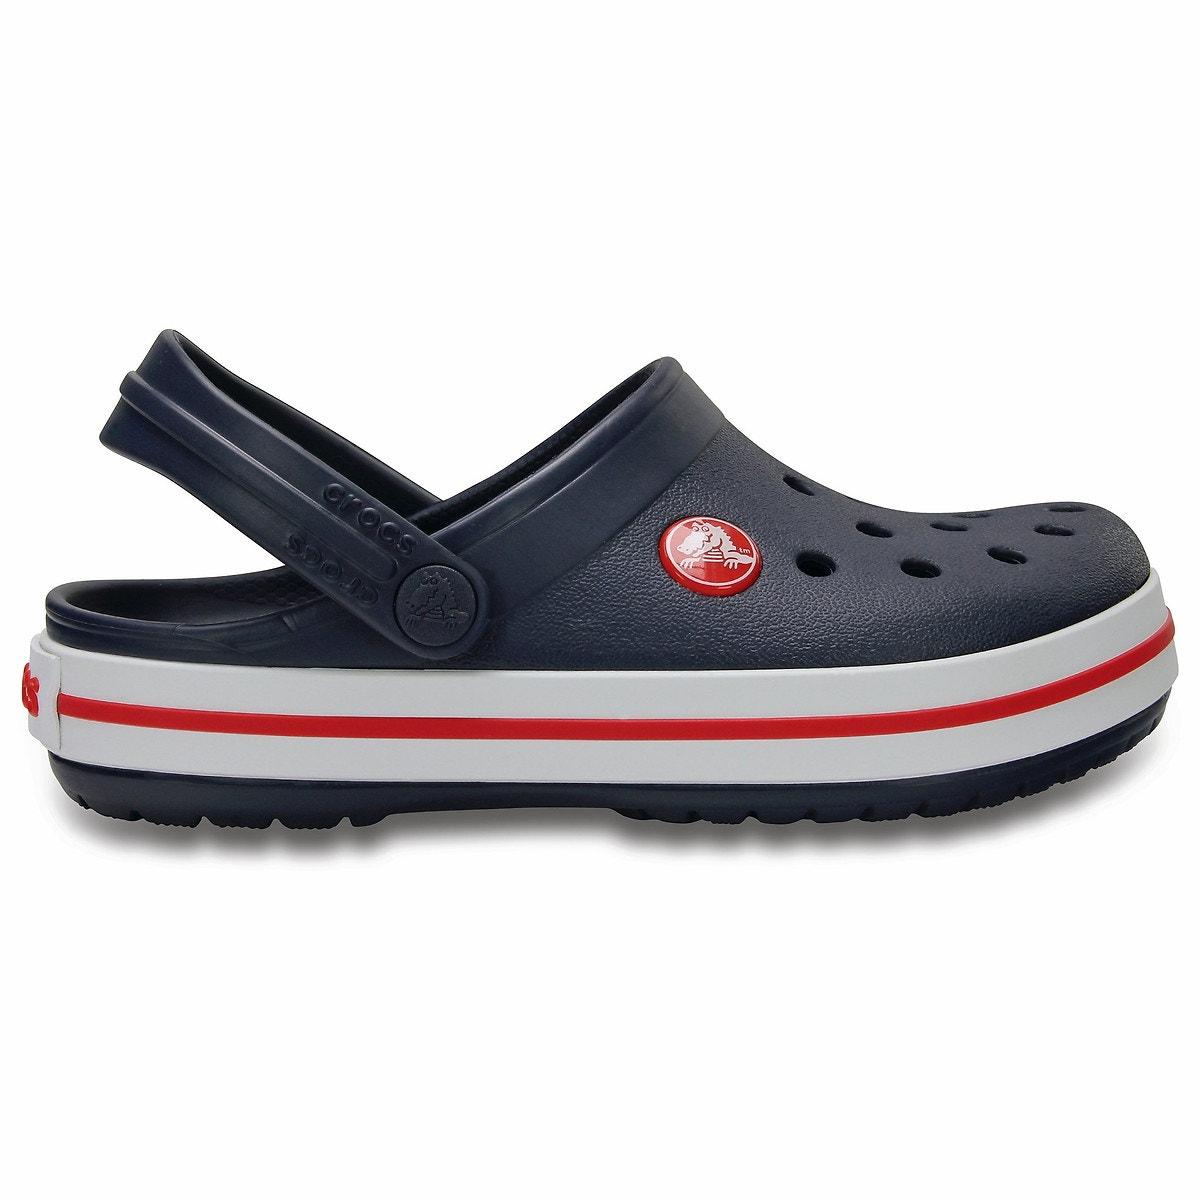 CROCS Crocband παιδι   παπούτσια   σανδάλια